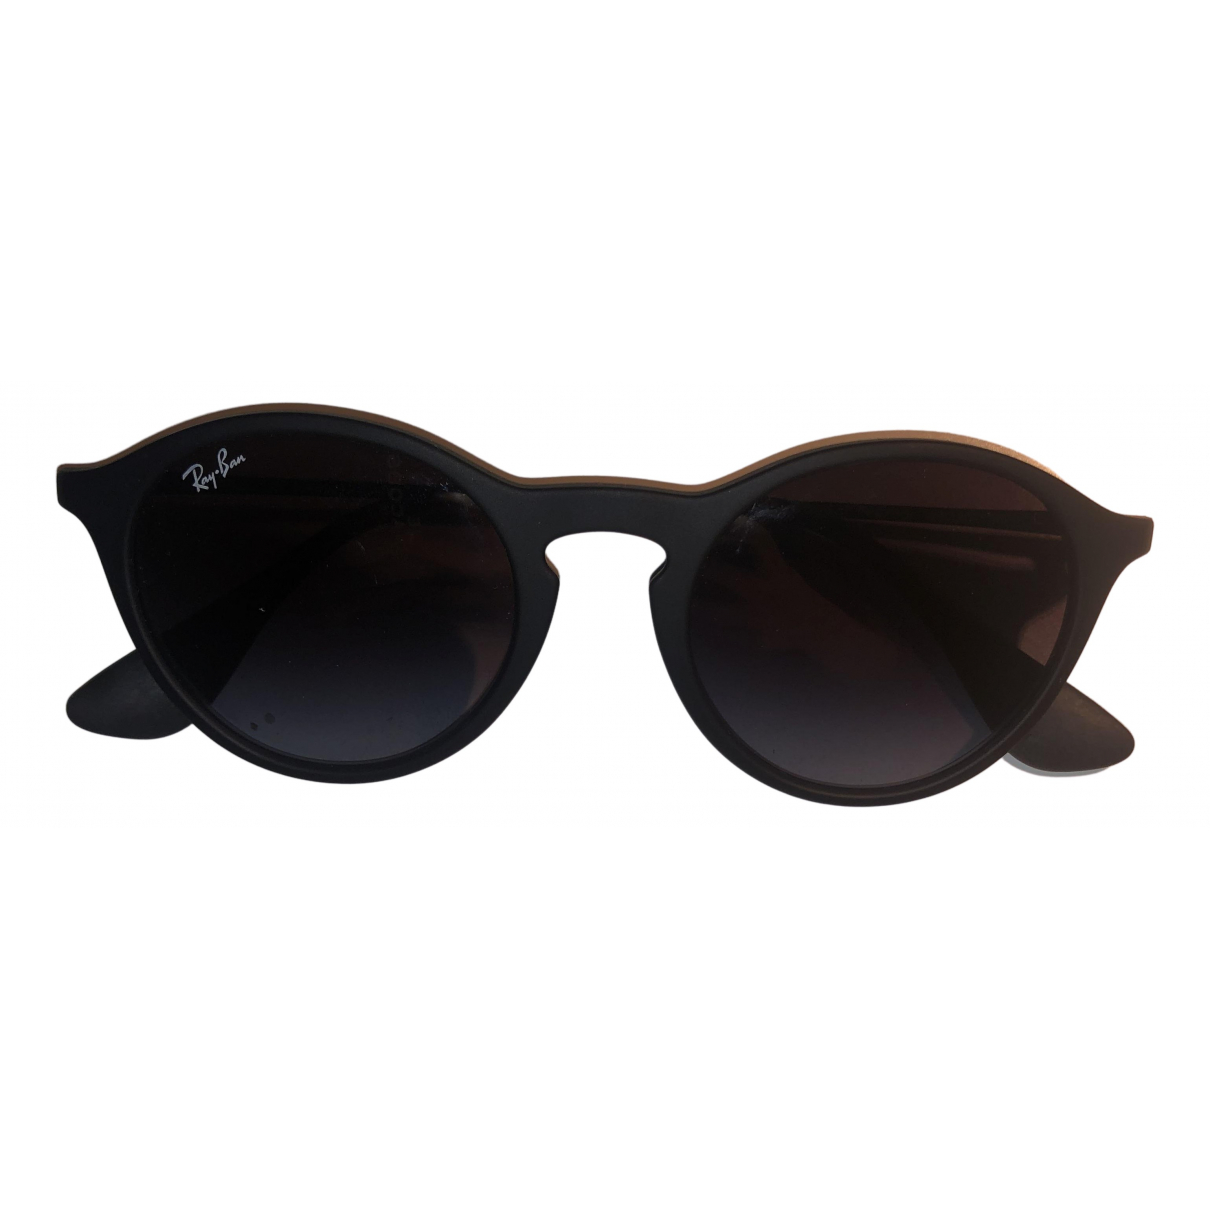 Ray-ban N Black Sunglasses for Women N